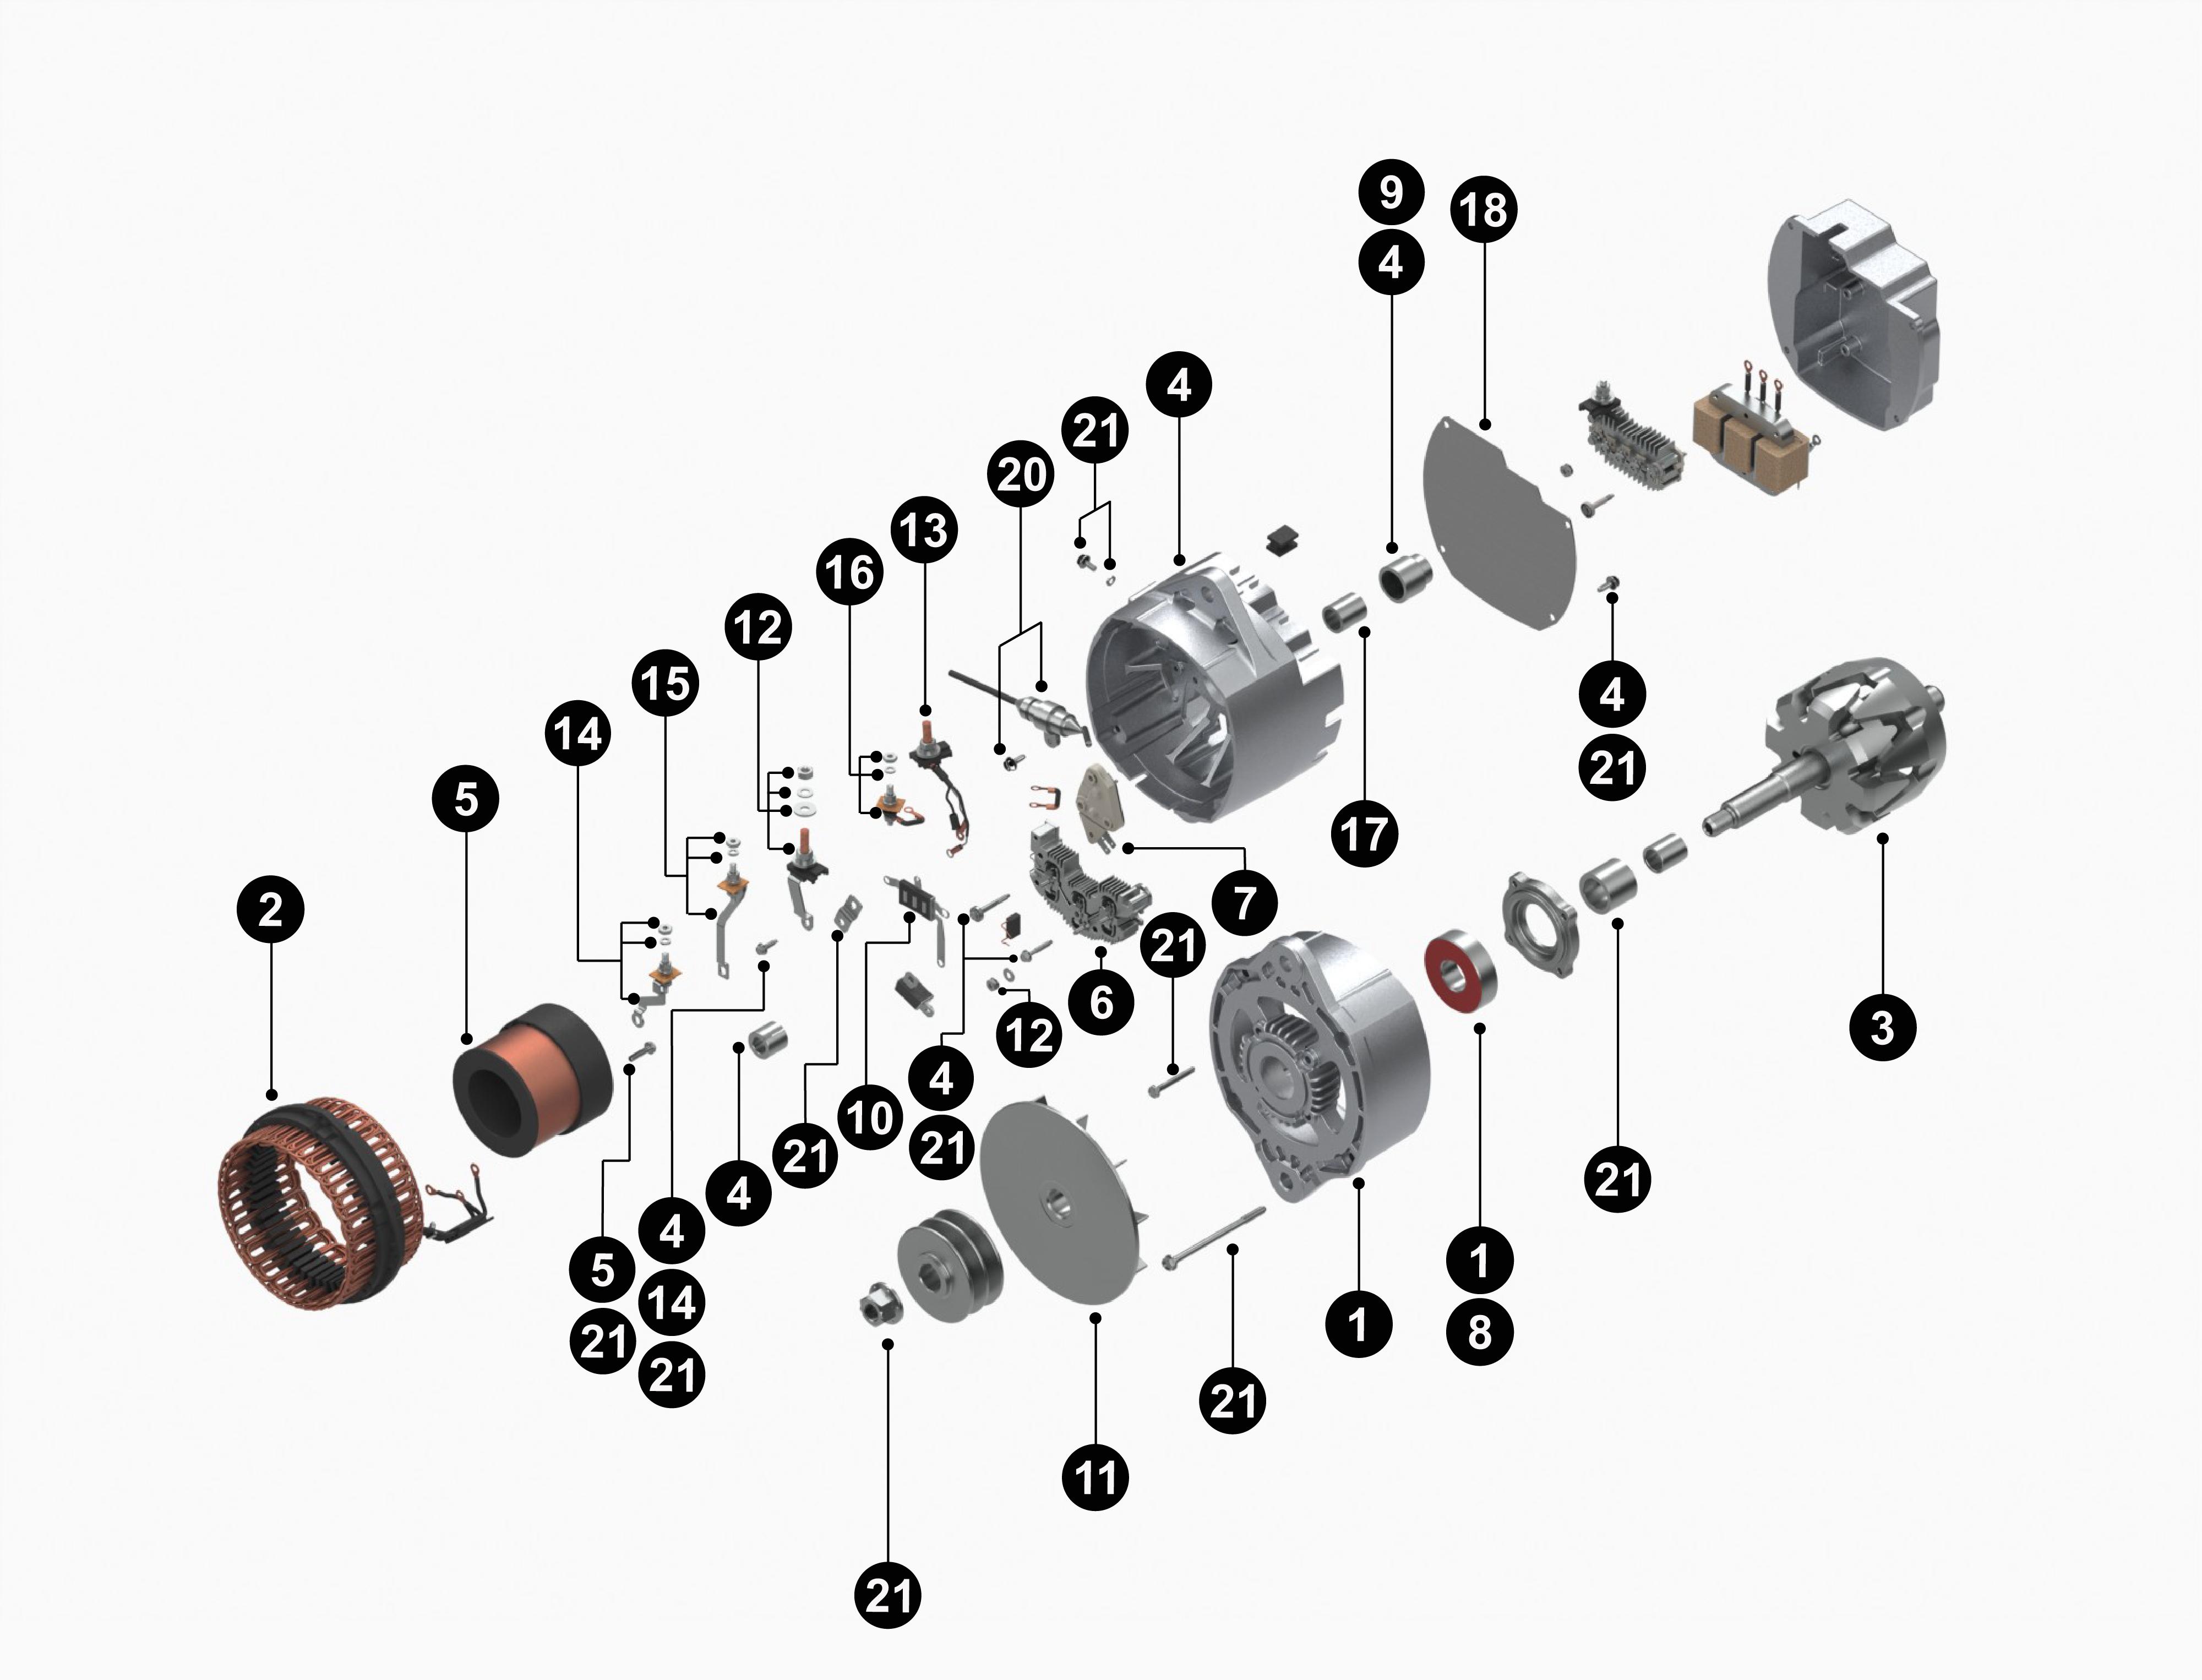 10459310 34SI Reman Alternator service parts